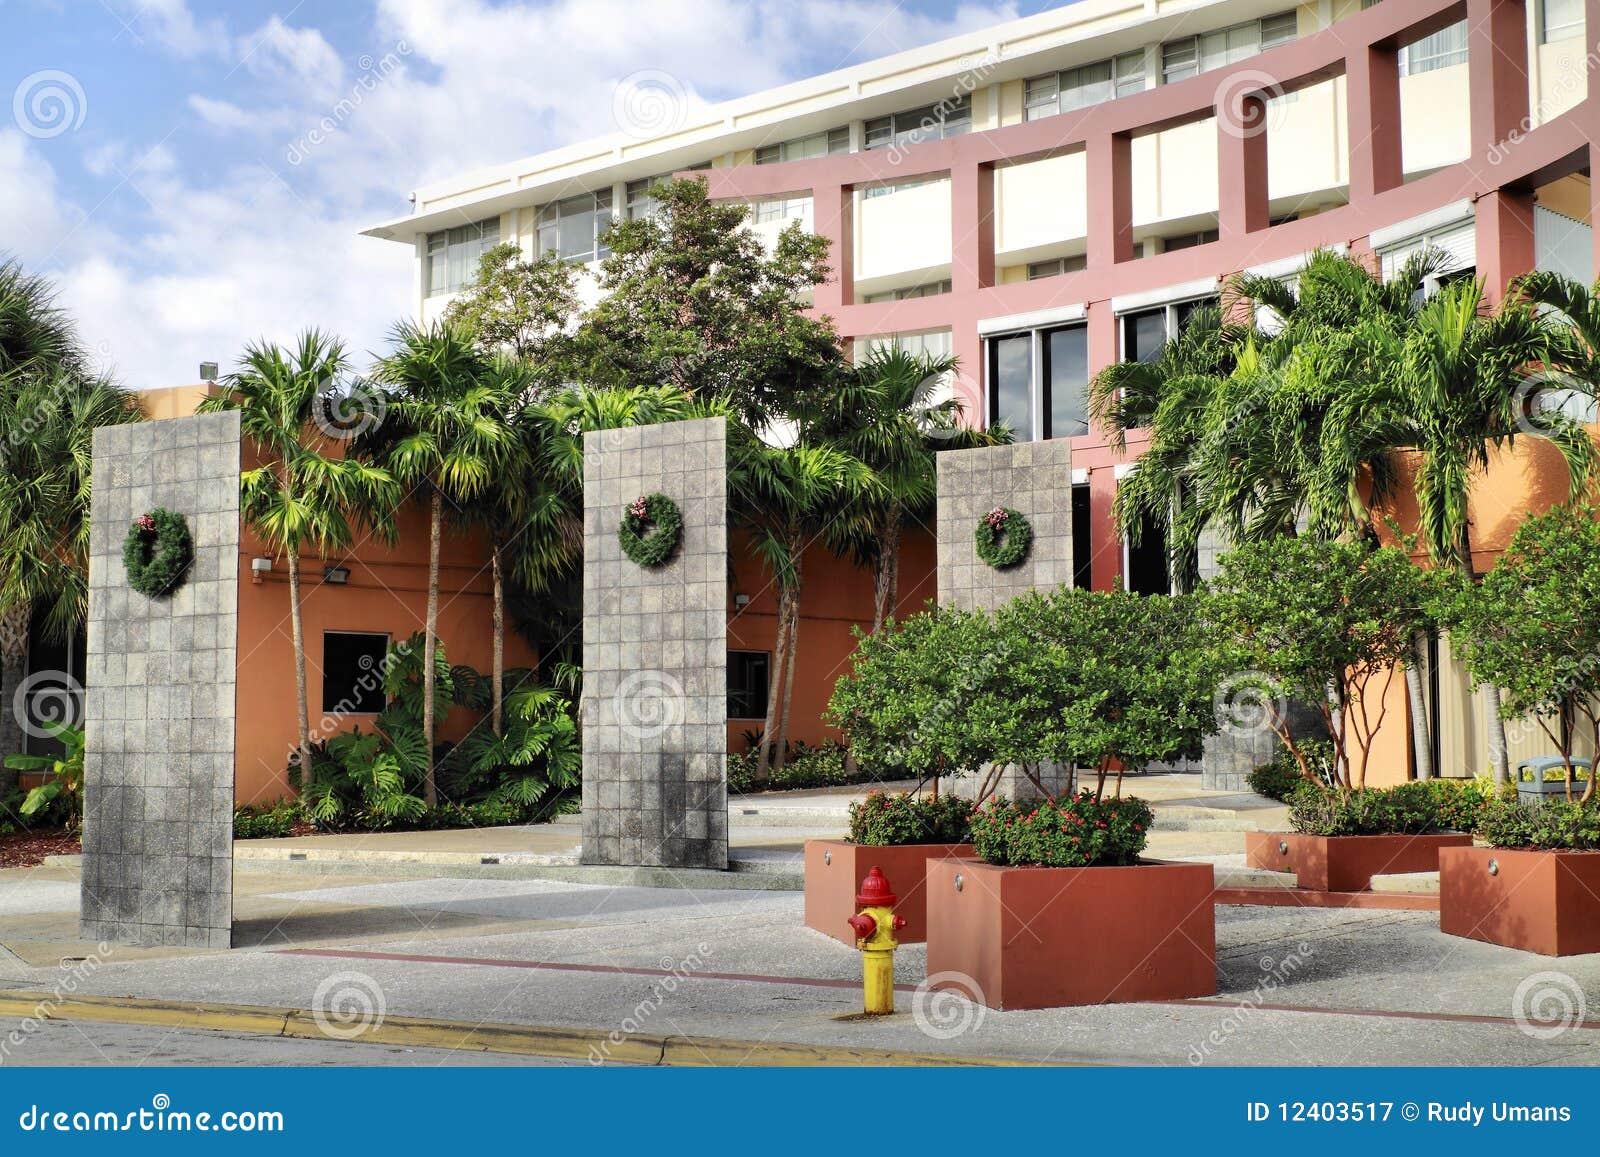 Johnson and Wales University Miami